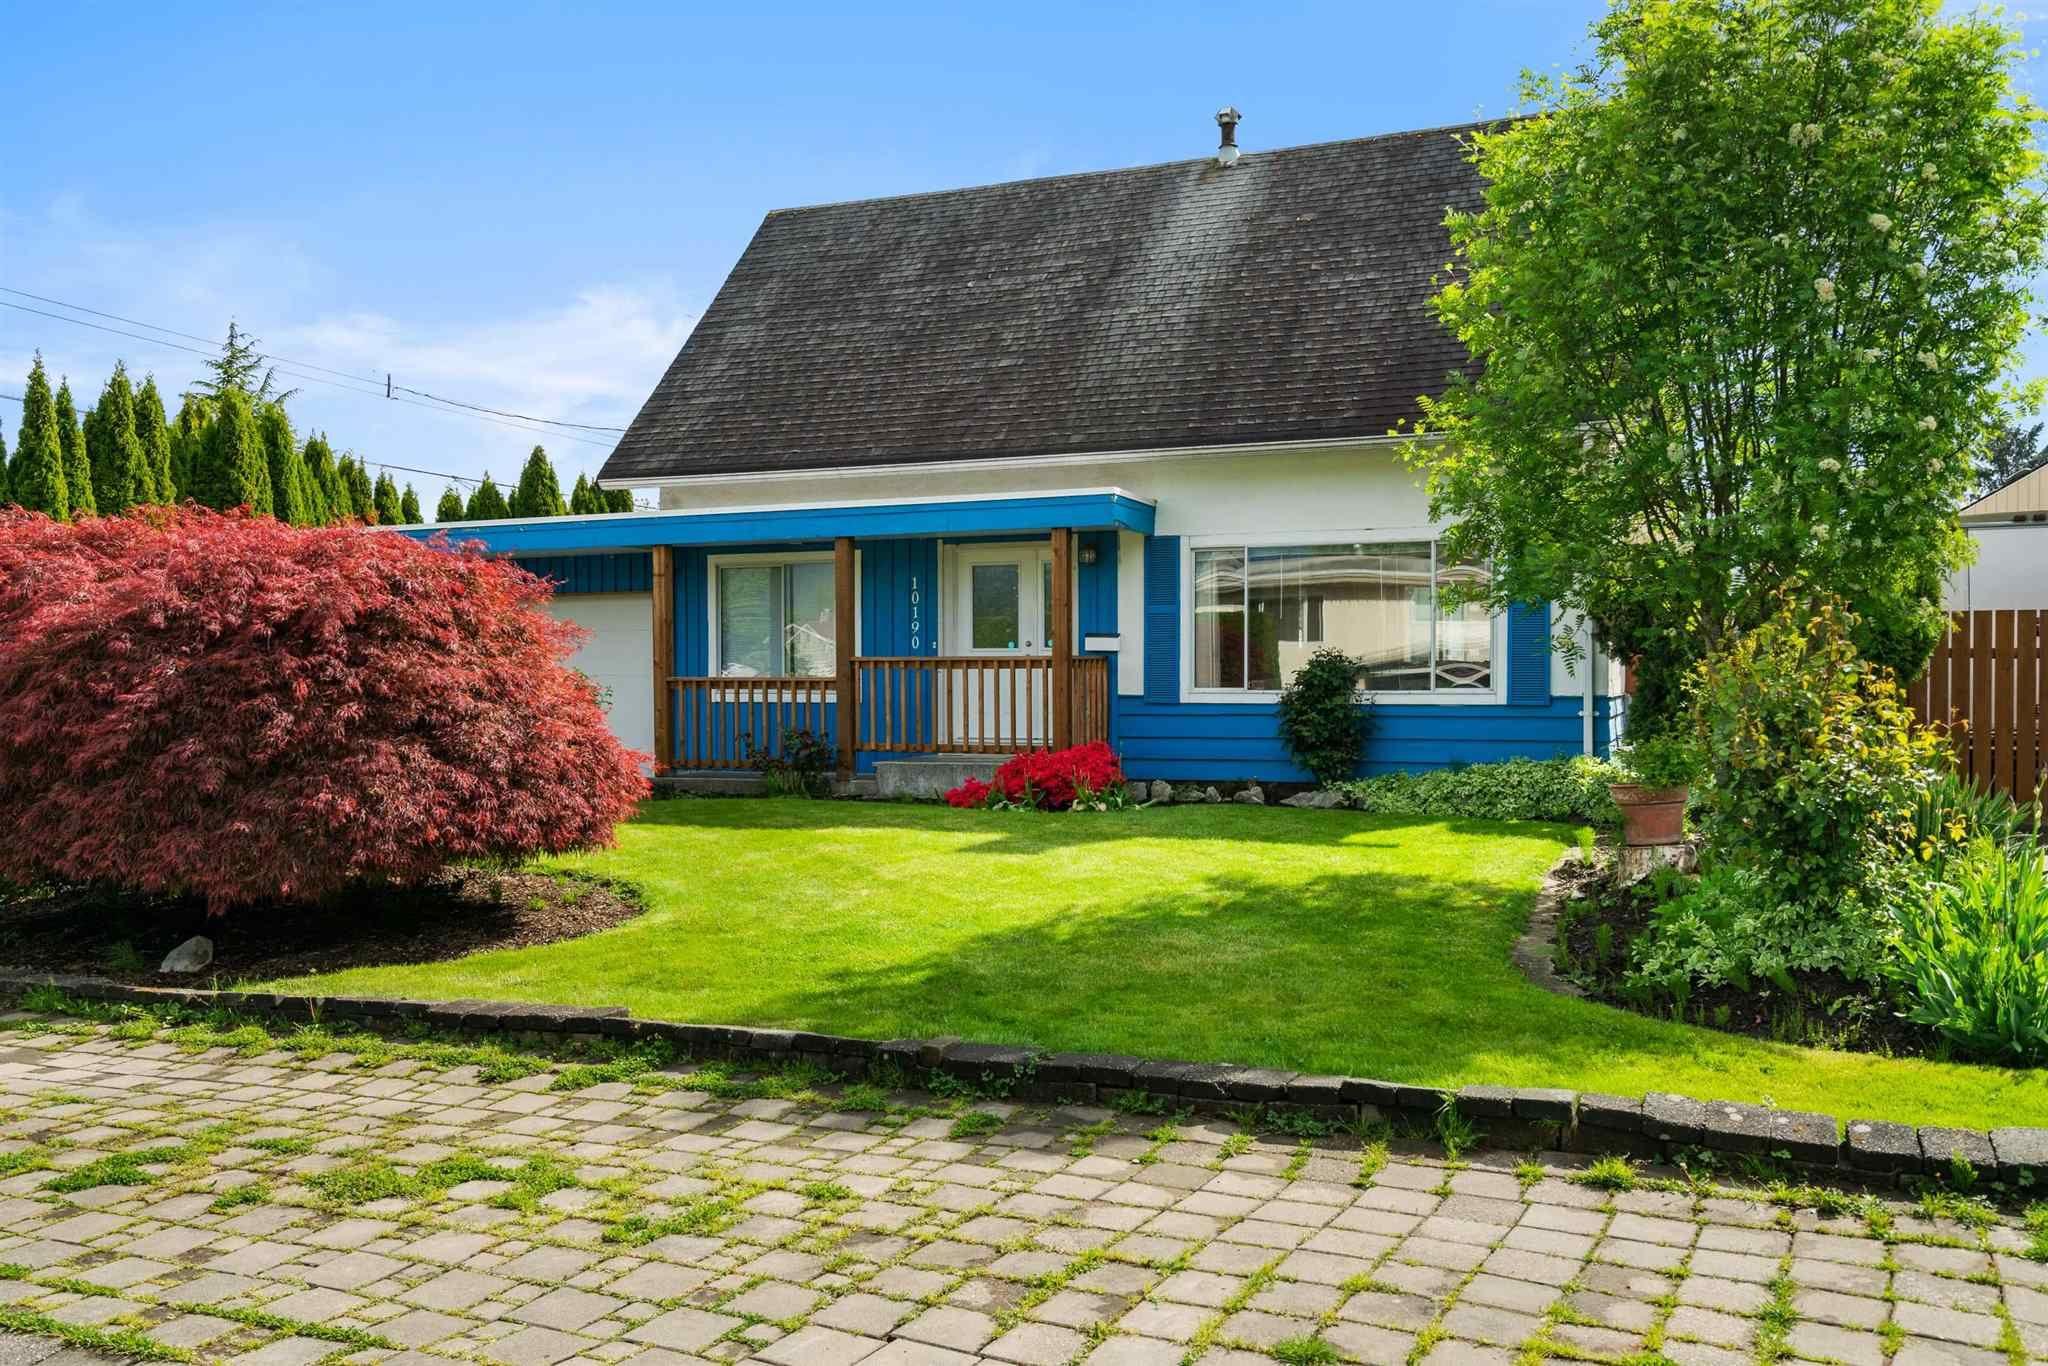 Main Photo: 10190 HYMAR Drive in Chilliwack: Fairfield Island House for sale : MLS®# R2593836